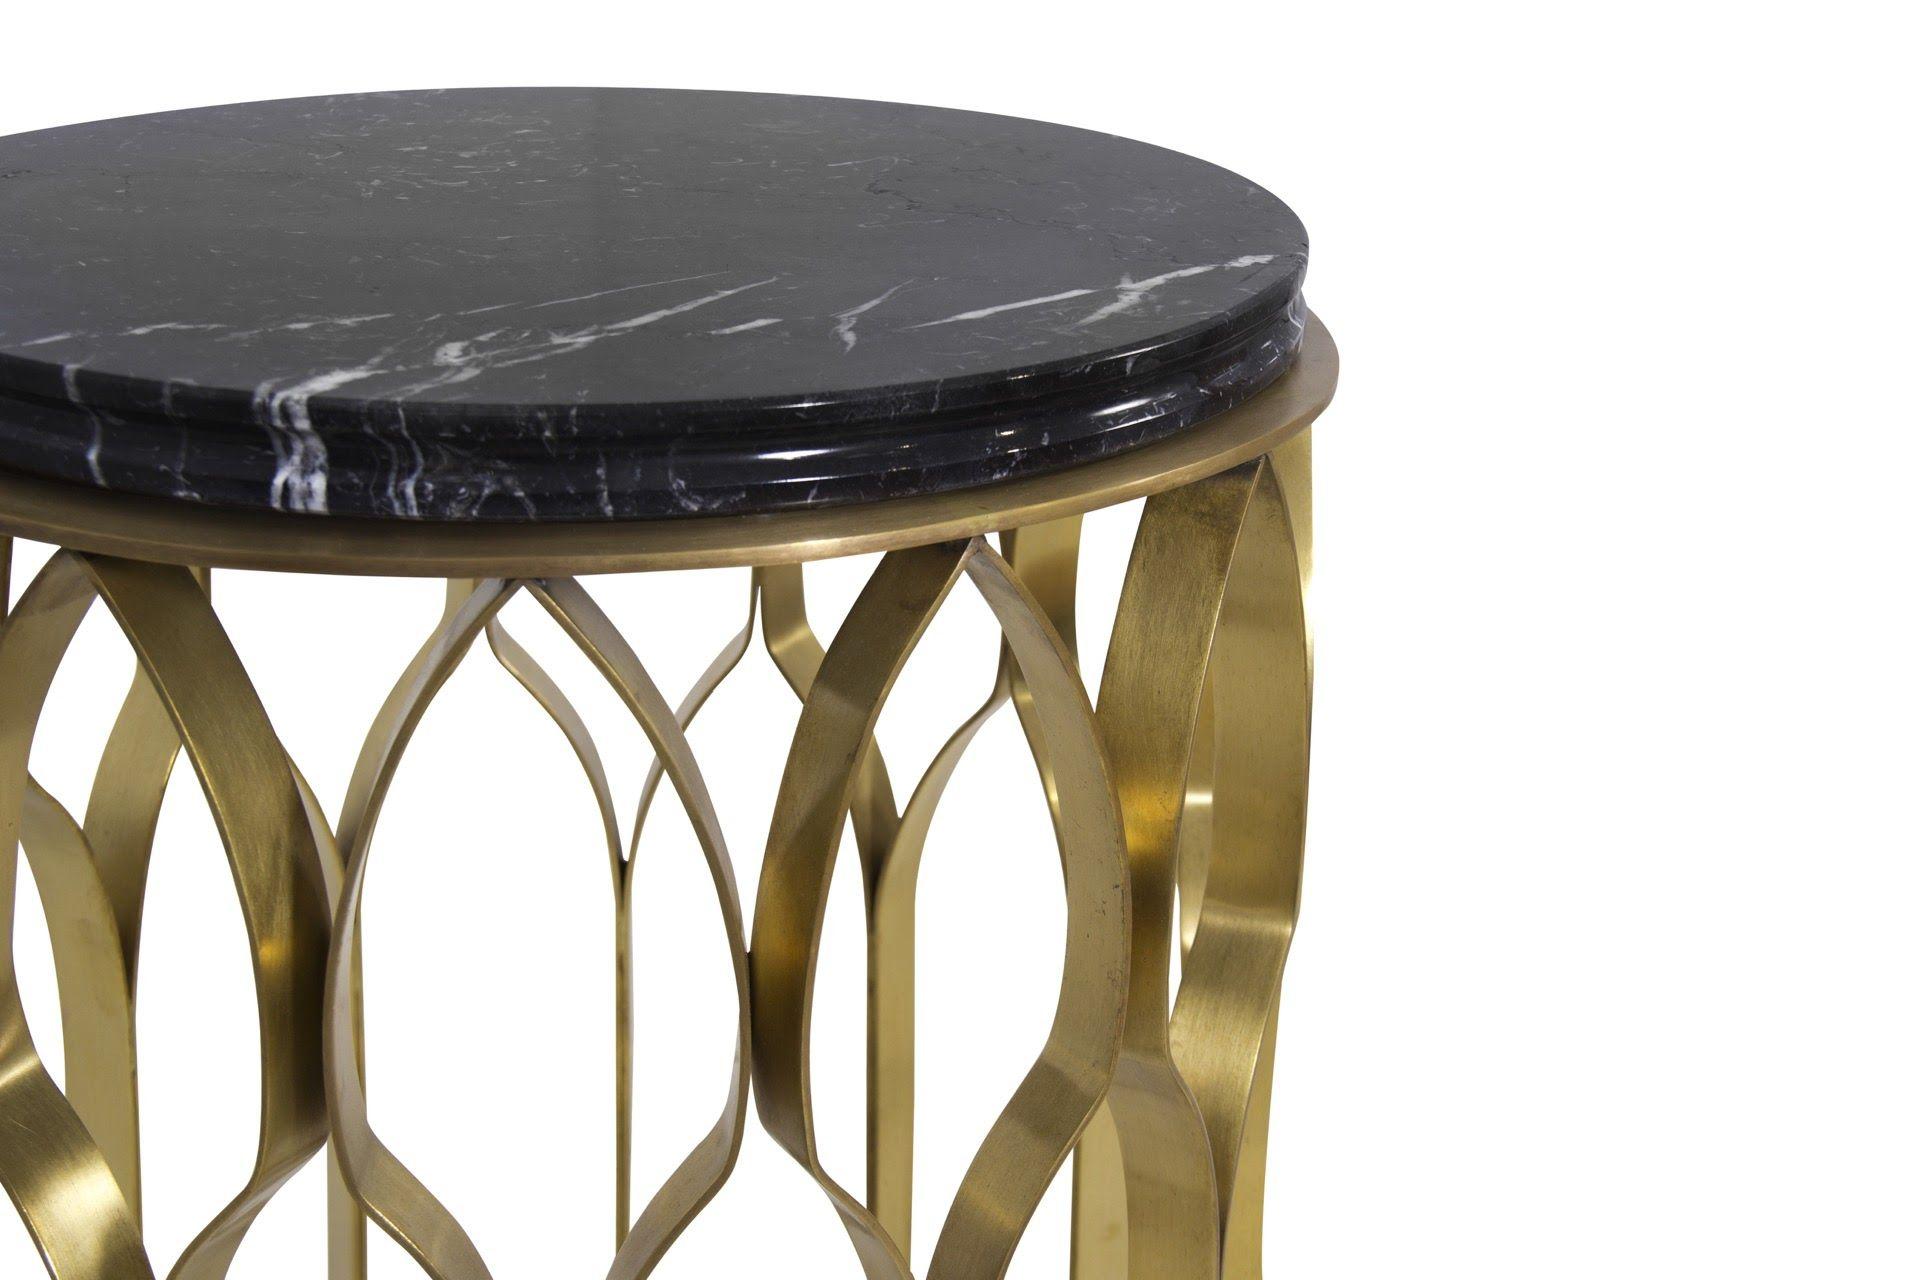 MECCA Side Table Brabbu materials Details